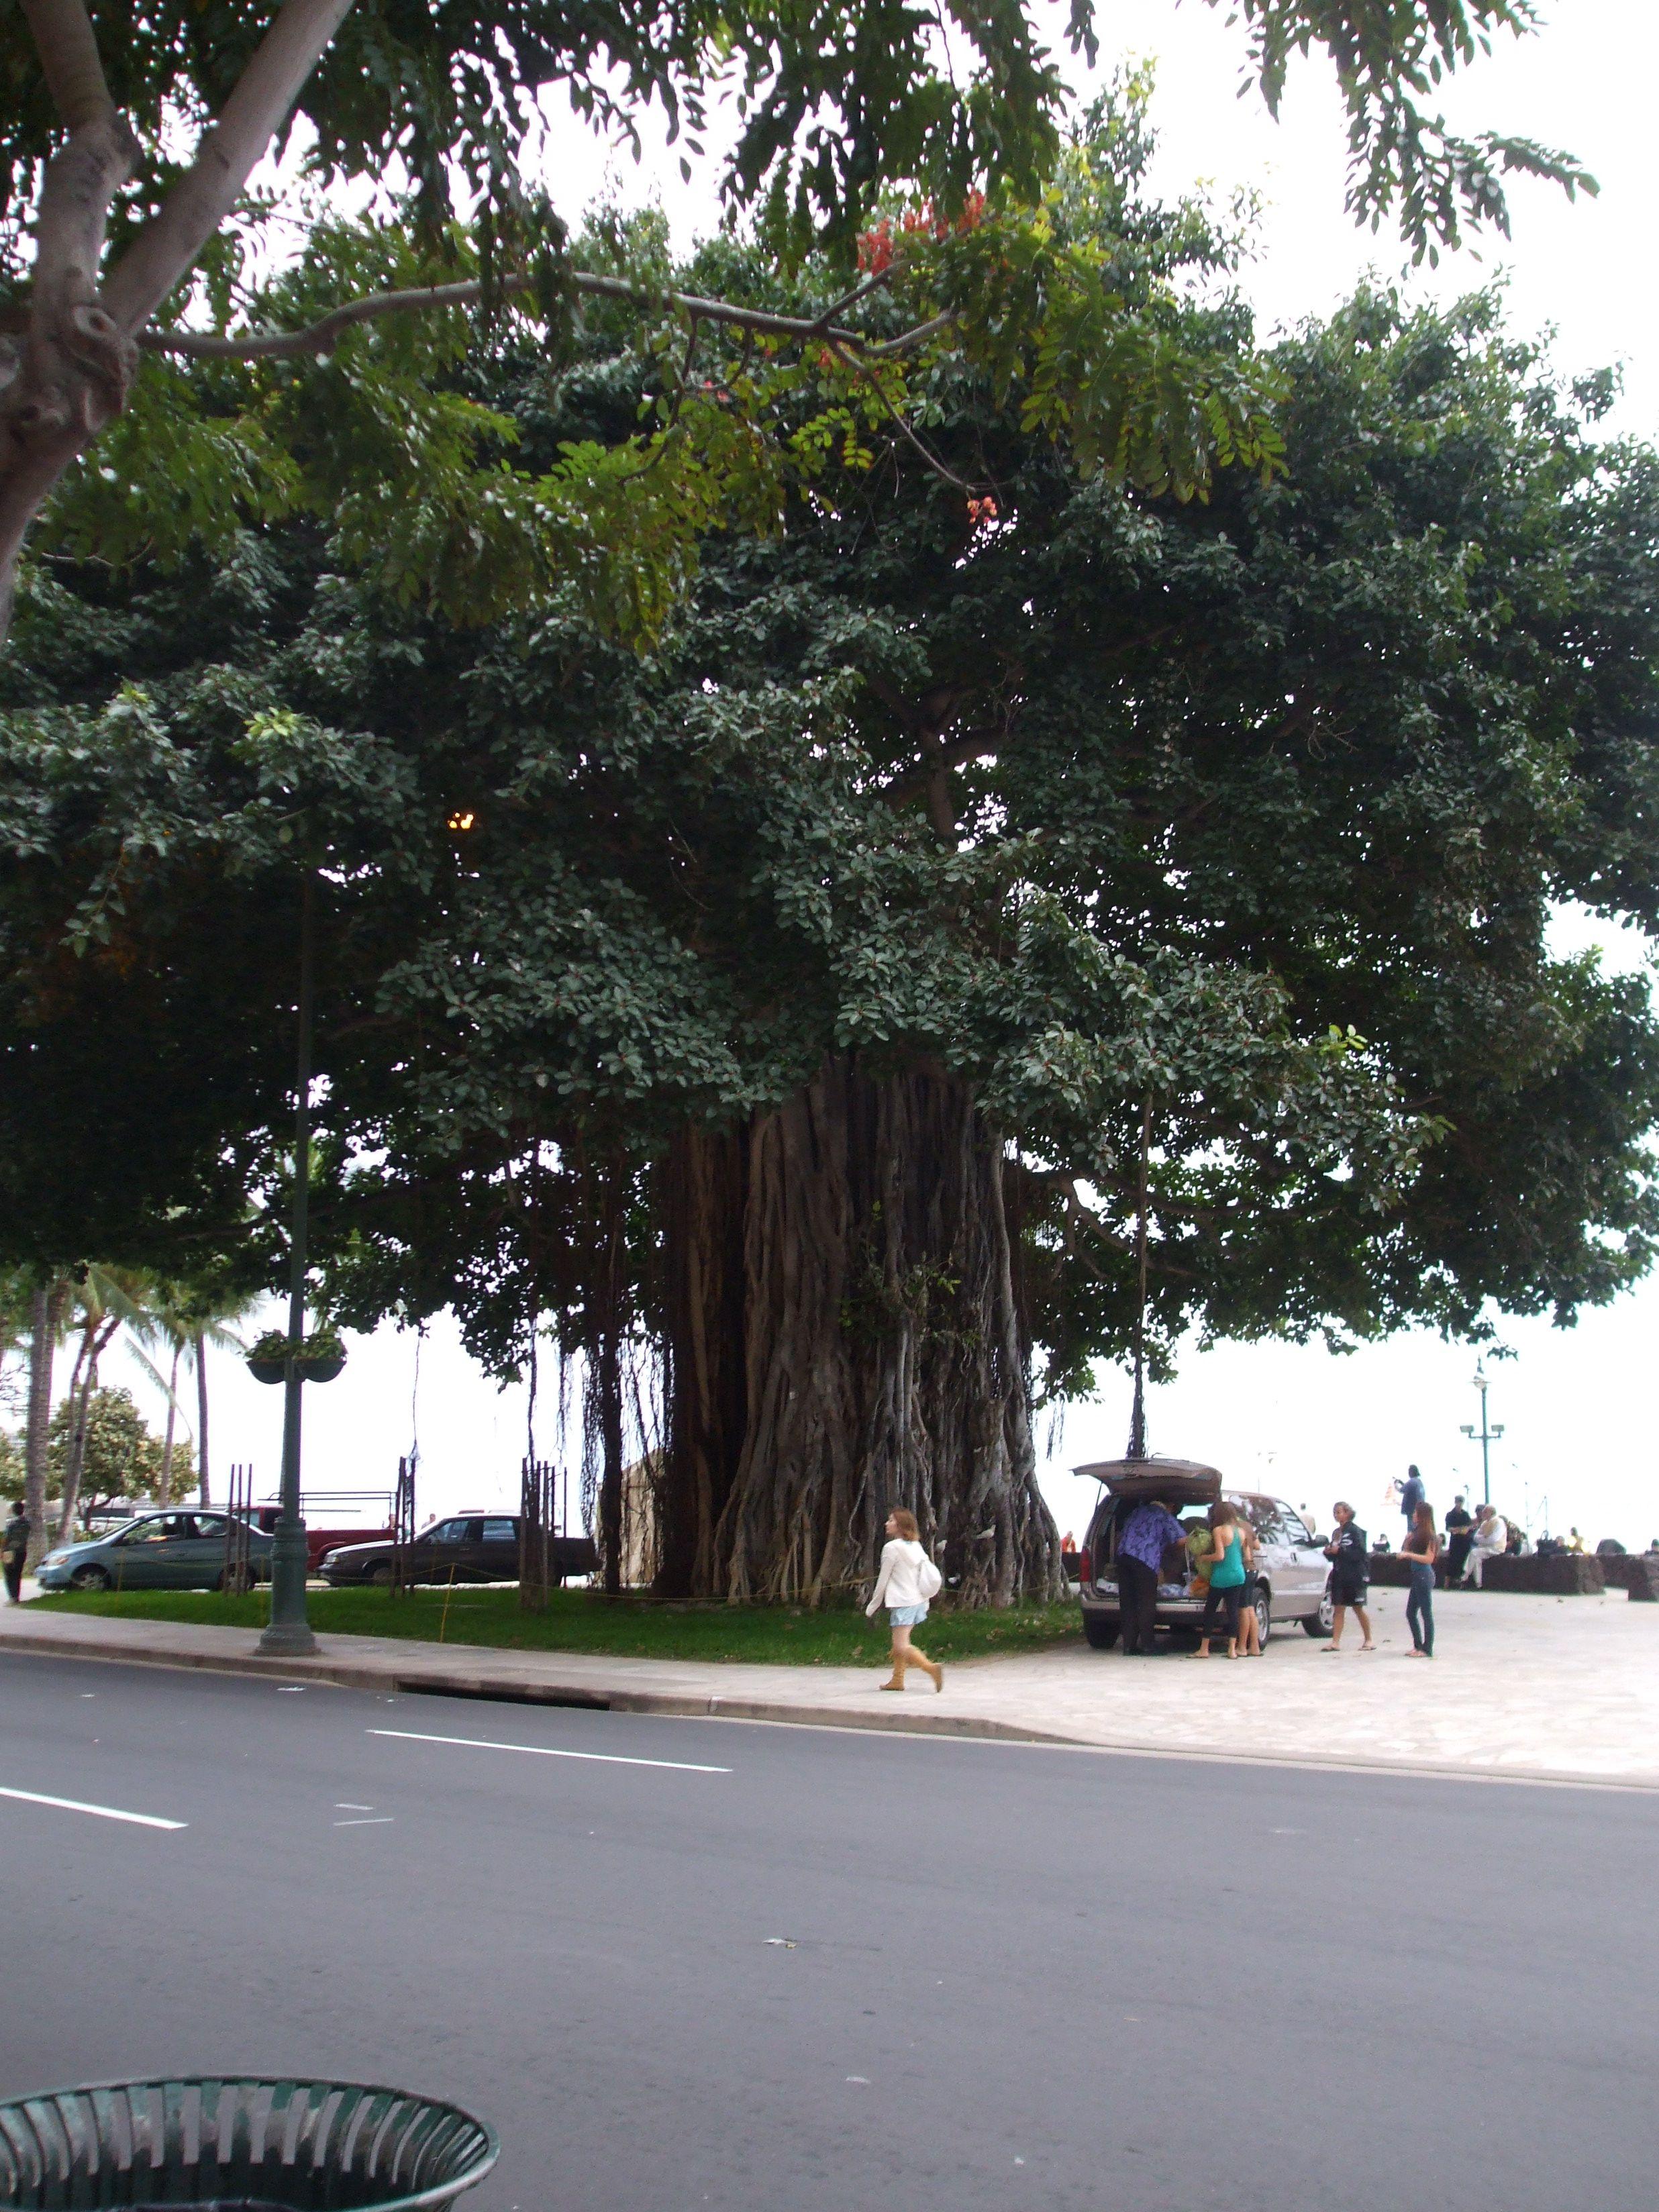 Banyan Tree In Waikiki We Used To